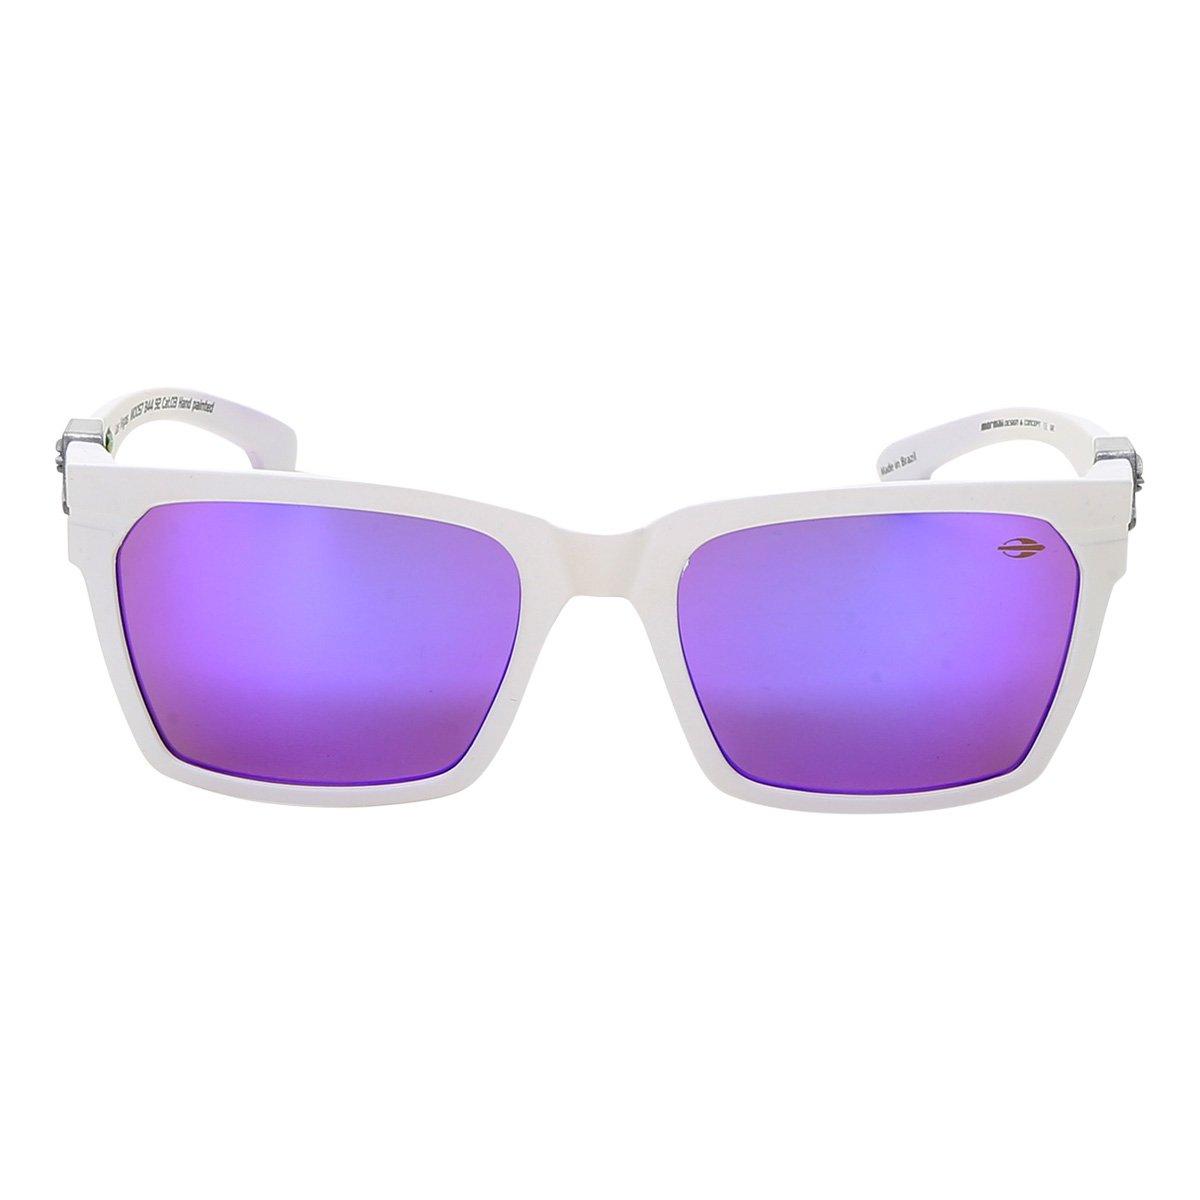 1162be50ce792 Óculos Mormaii Las Vegas M0057B4492 Masculino - Compre Agora   Zattini